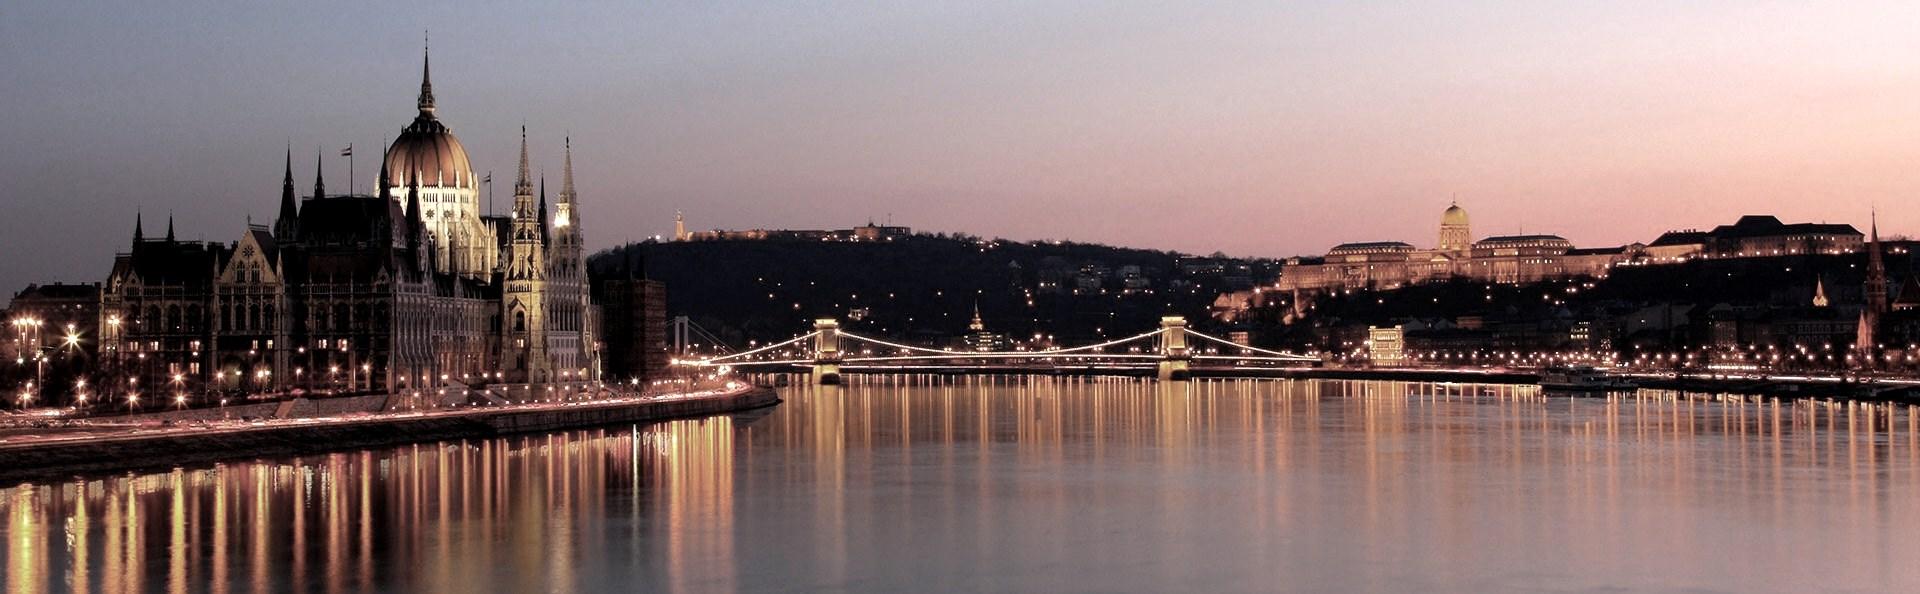 budapest 16.jpg